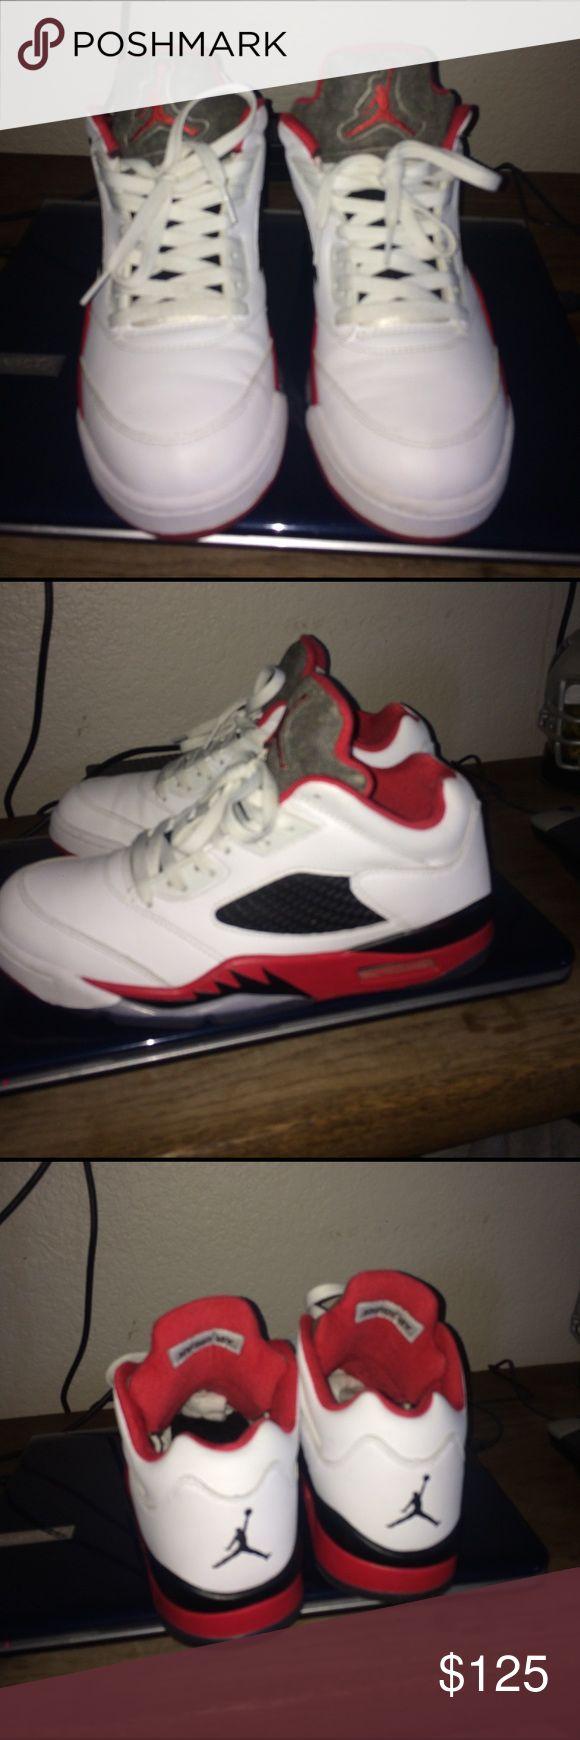 Jordan low 5s size 9.5 8/10 condition size 9.5 jordan 5 low Jordan Shoes